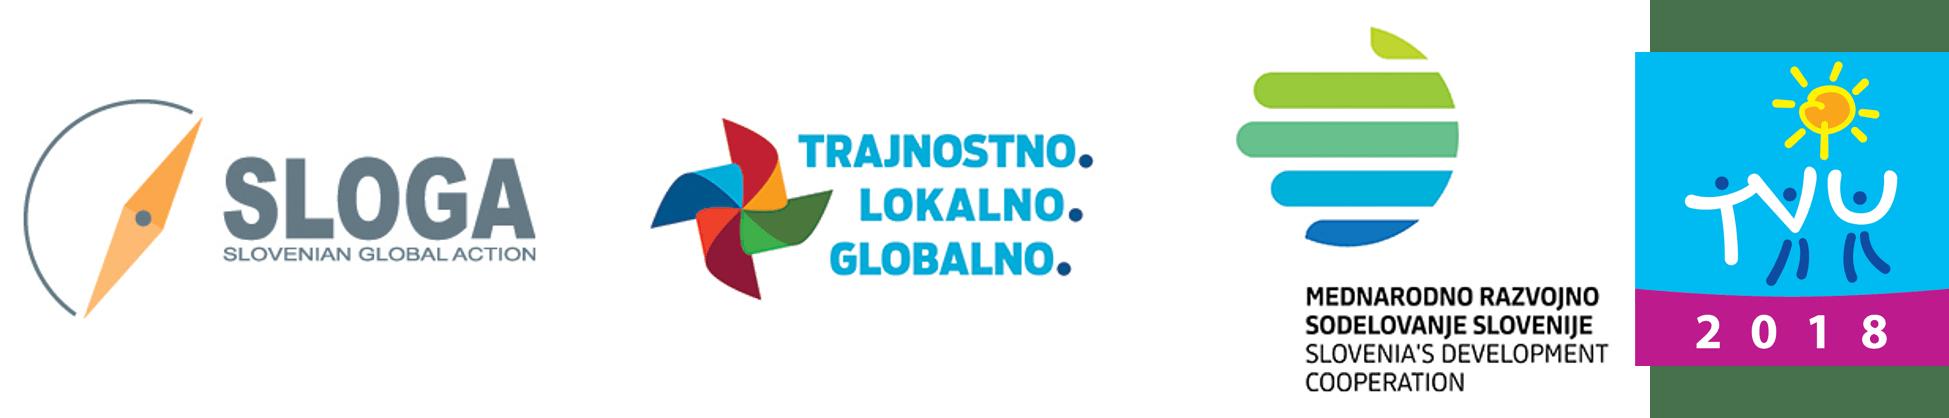 TLG, SLOGA, MRS, TVU logo